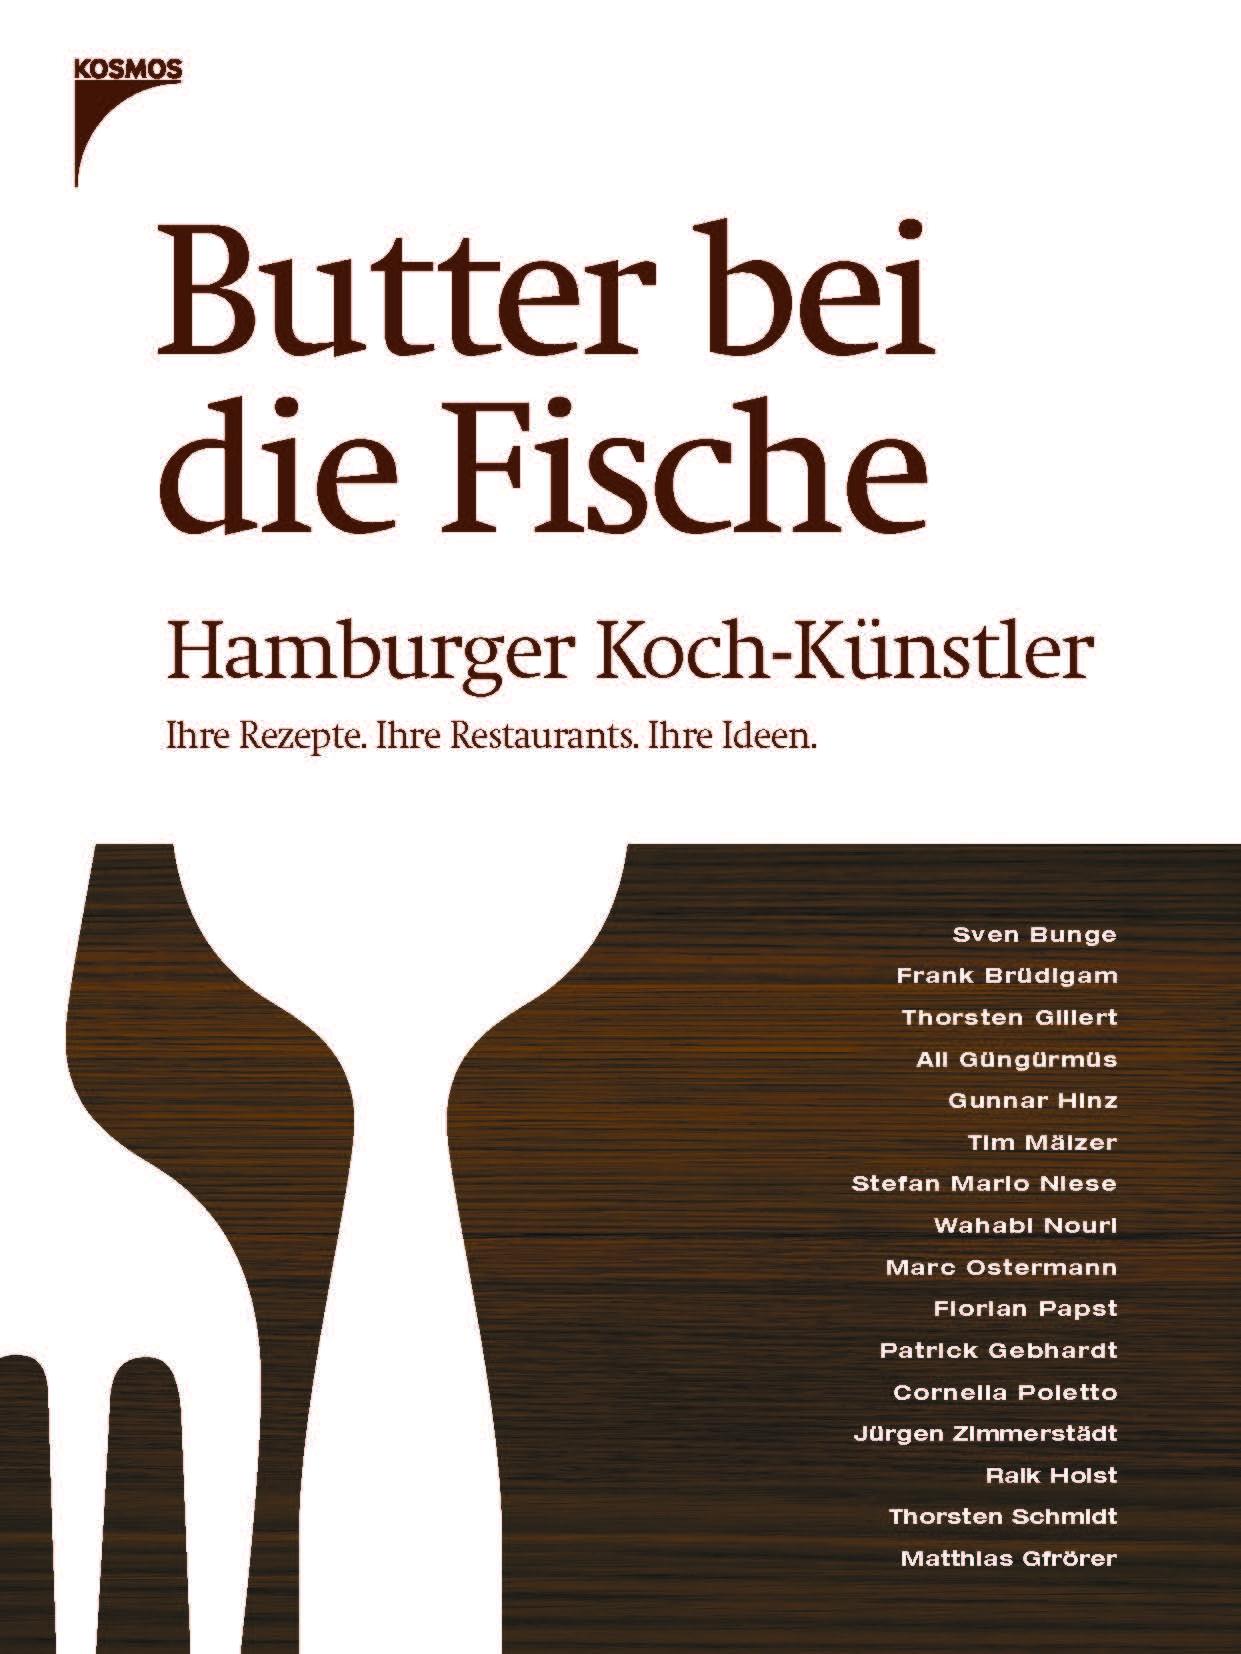 [k]lecker Kochbuch_13C